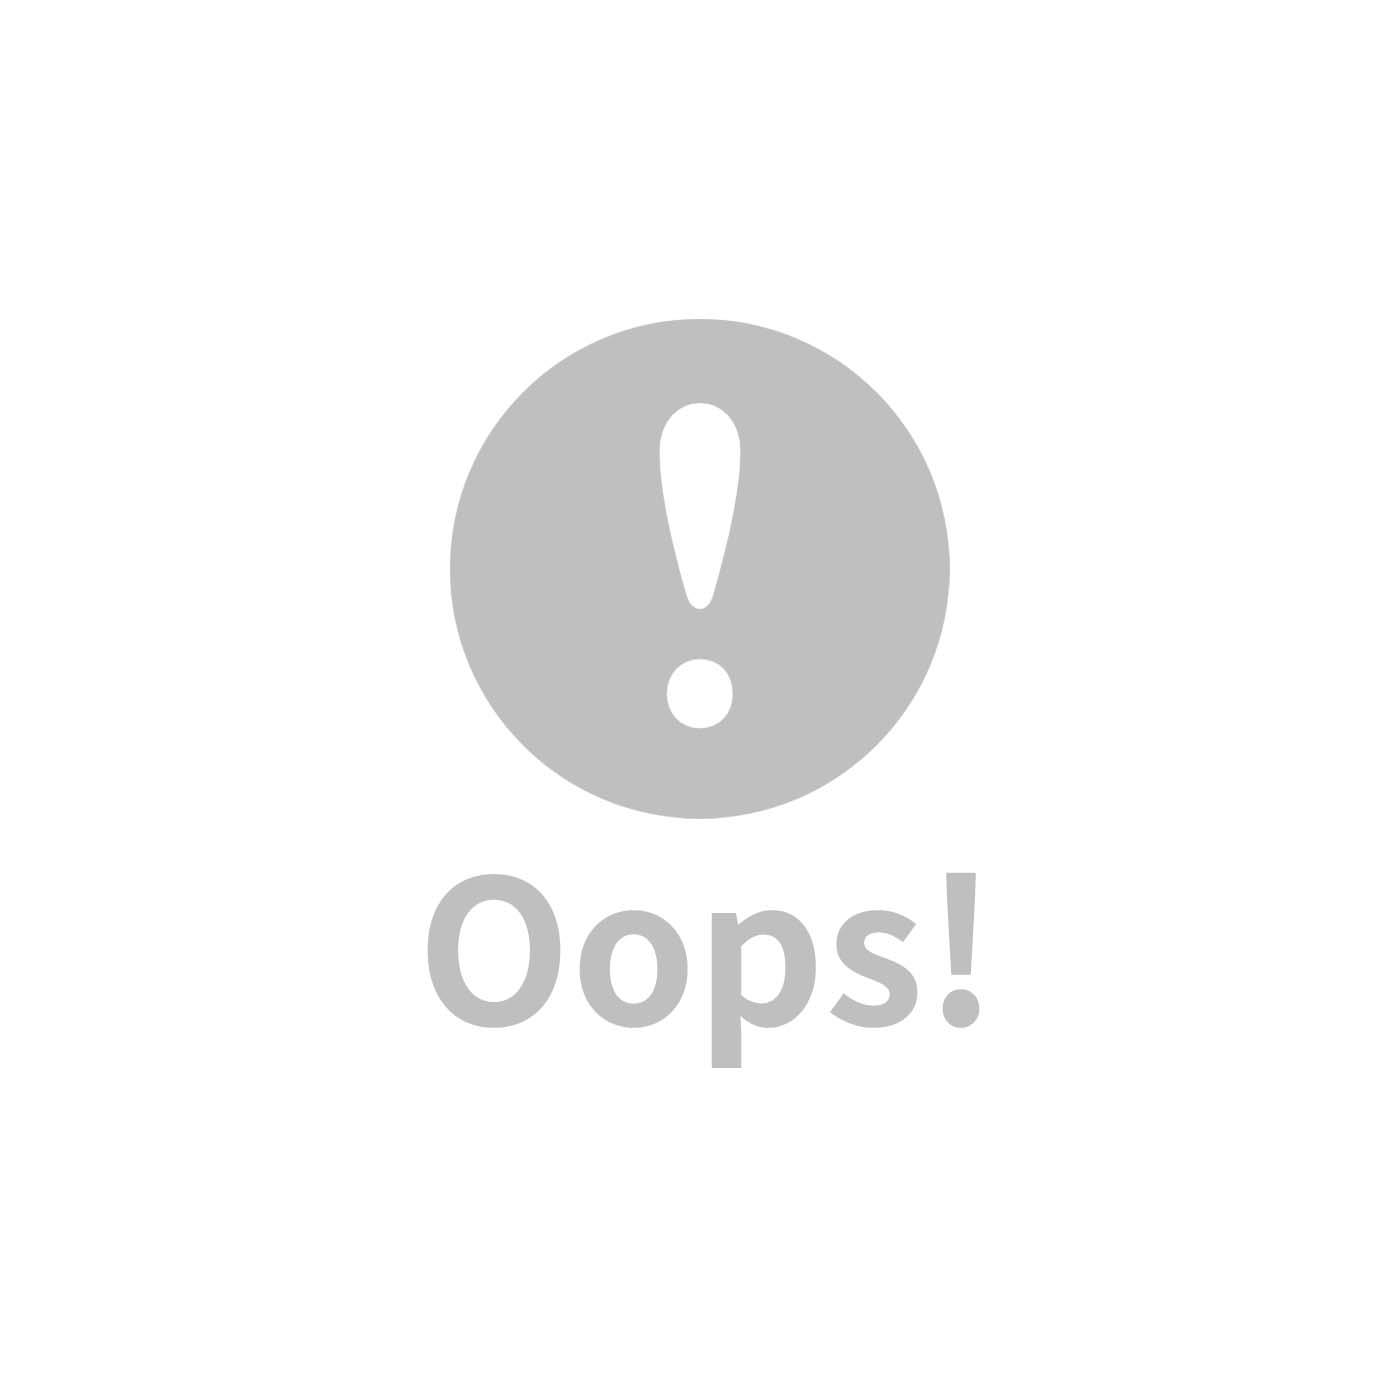 air cossi 透氣抗菌天絲嬰兒床墊(清新綠)